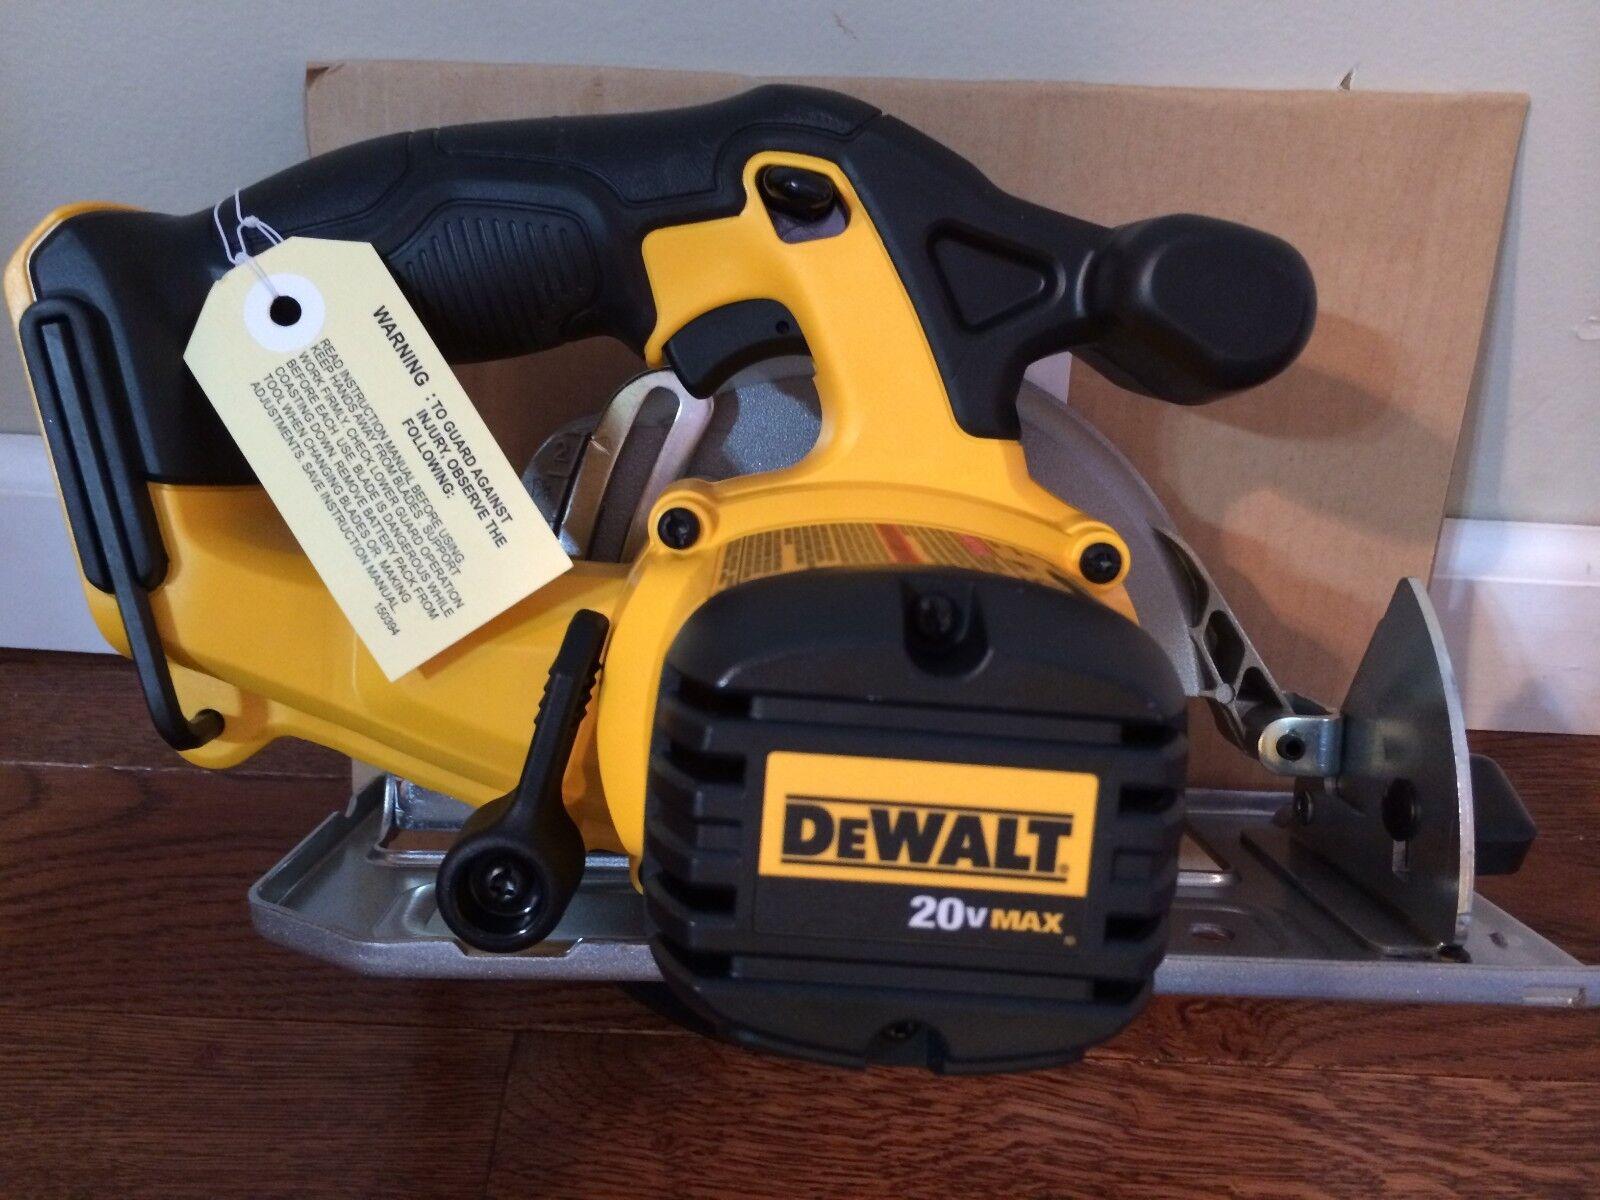 20v dewalt cordless circular saw dcs393 bare tool only ebay greentooth Choice Image